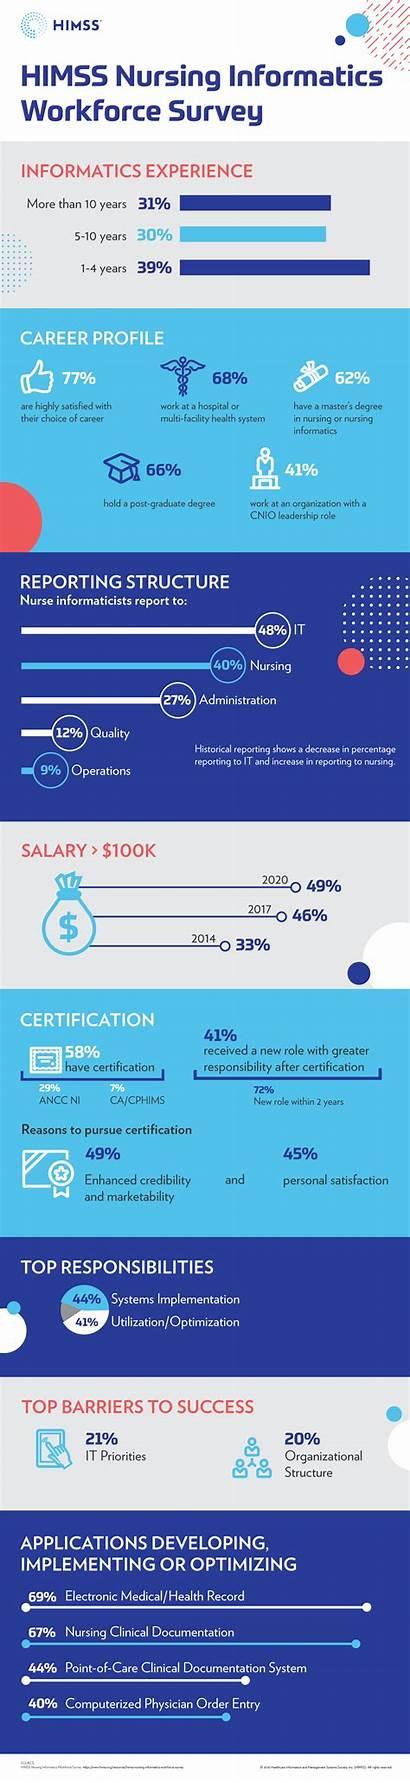 Nursing Informatics Infographic Workforce Himss Survey Source